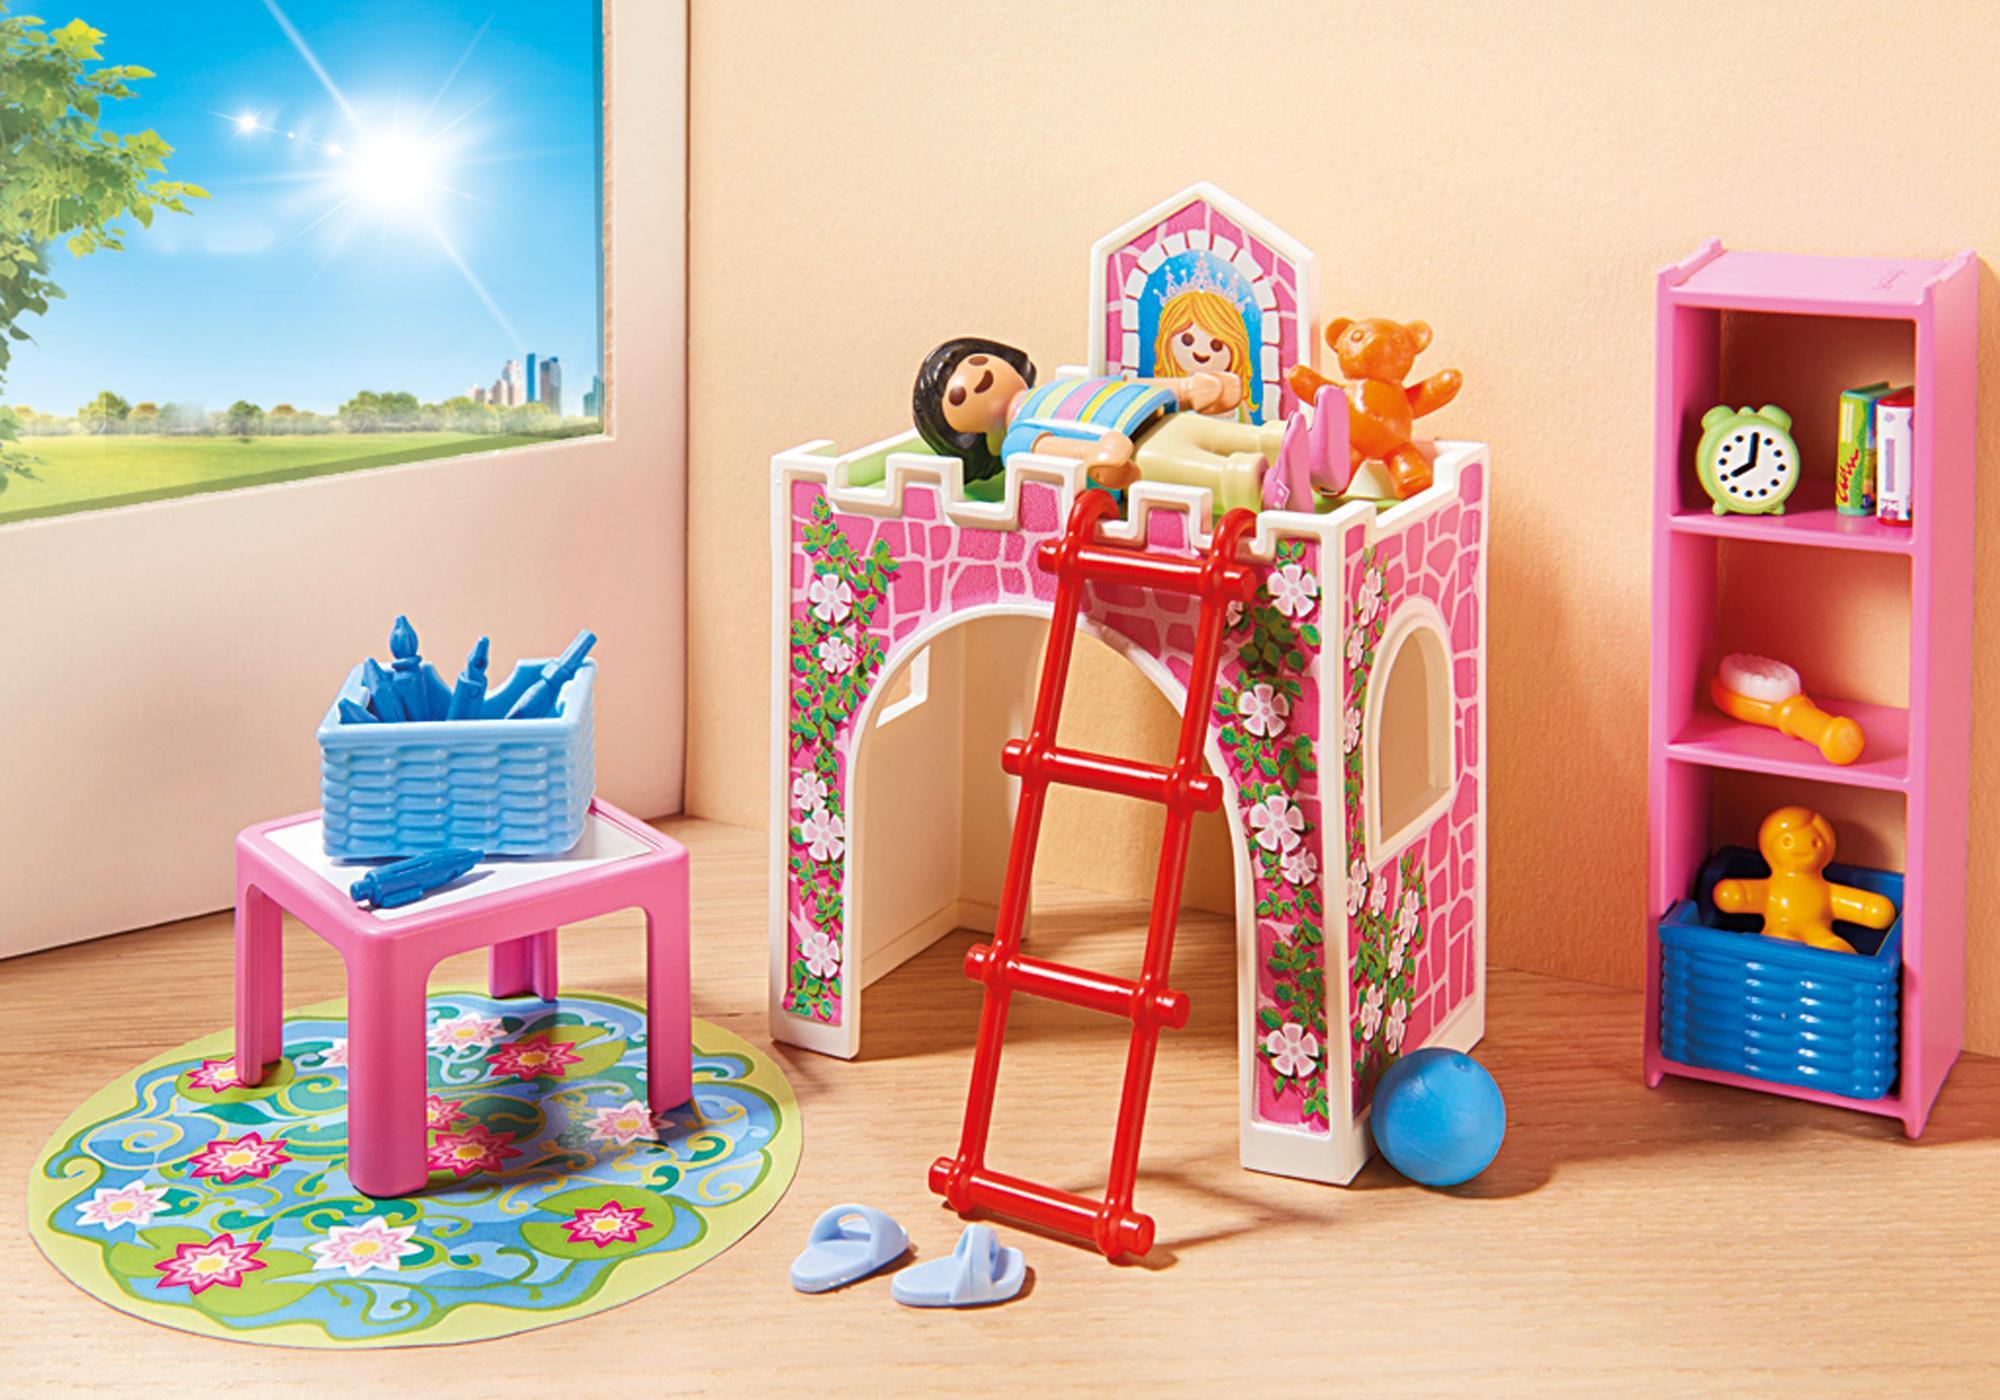 http://media.playmobil.com/i/playmobil/9270_product_extra1/Fröhliches Kinderzimmer